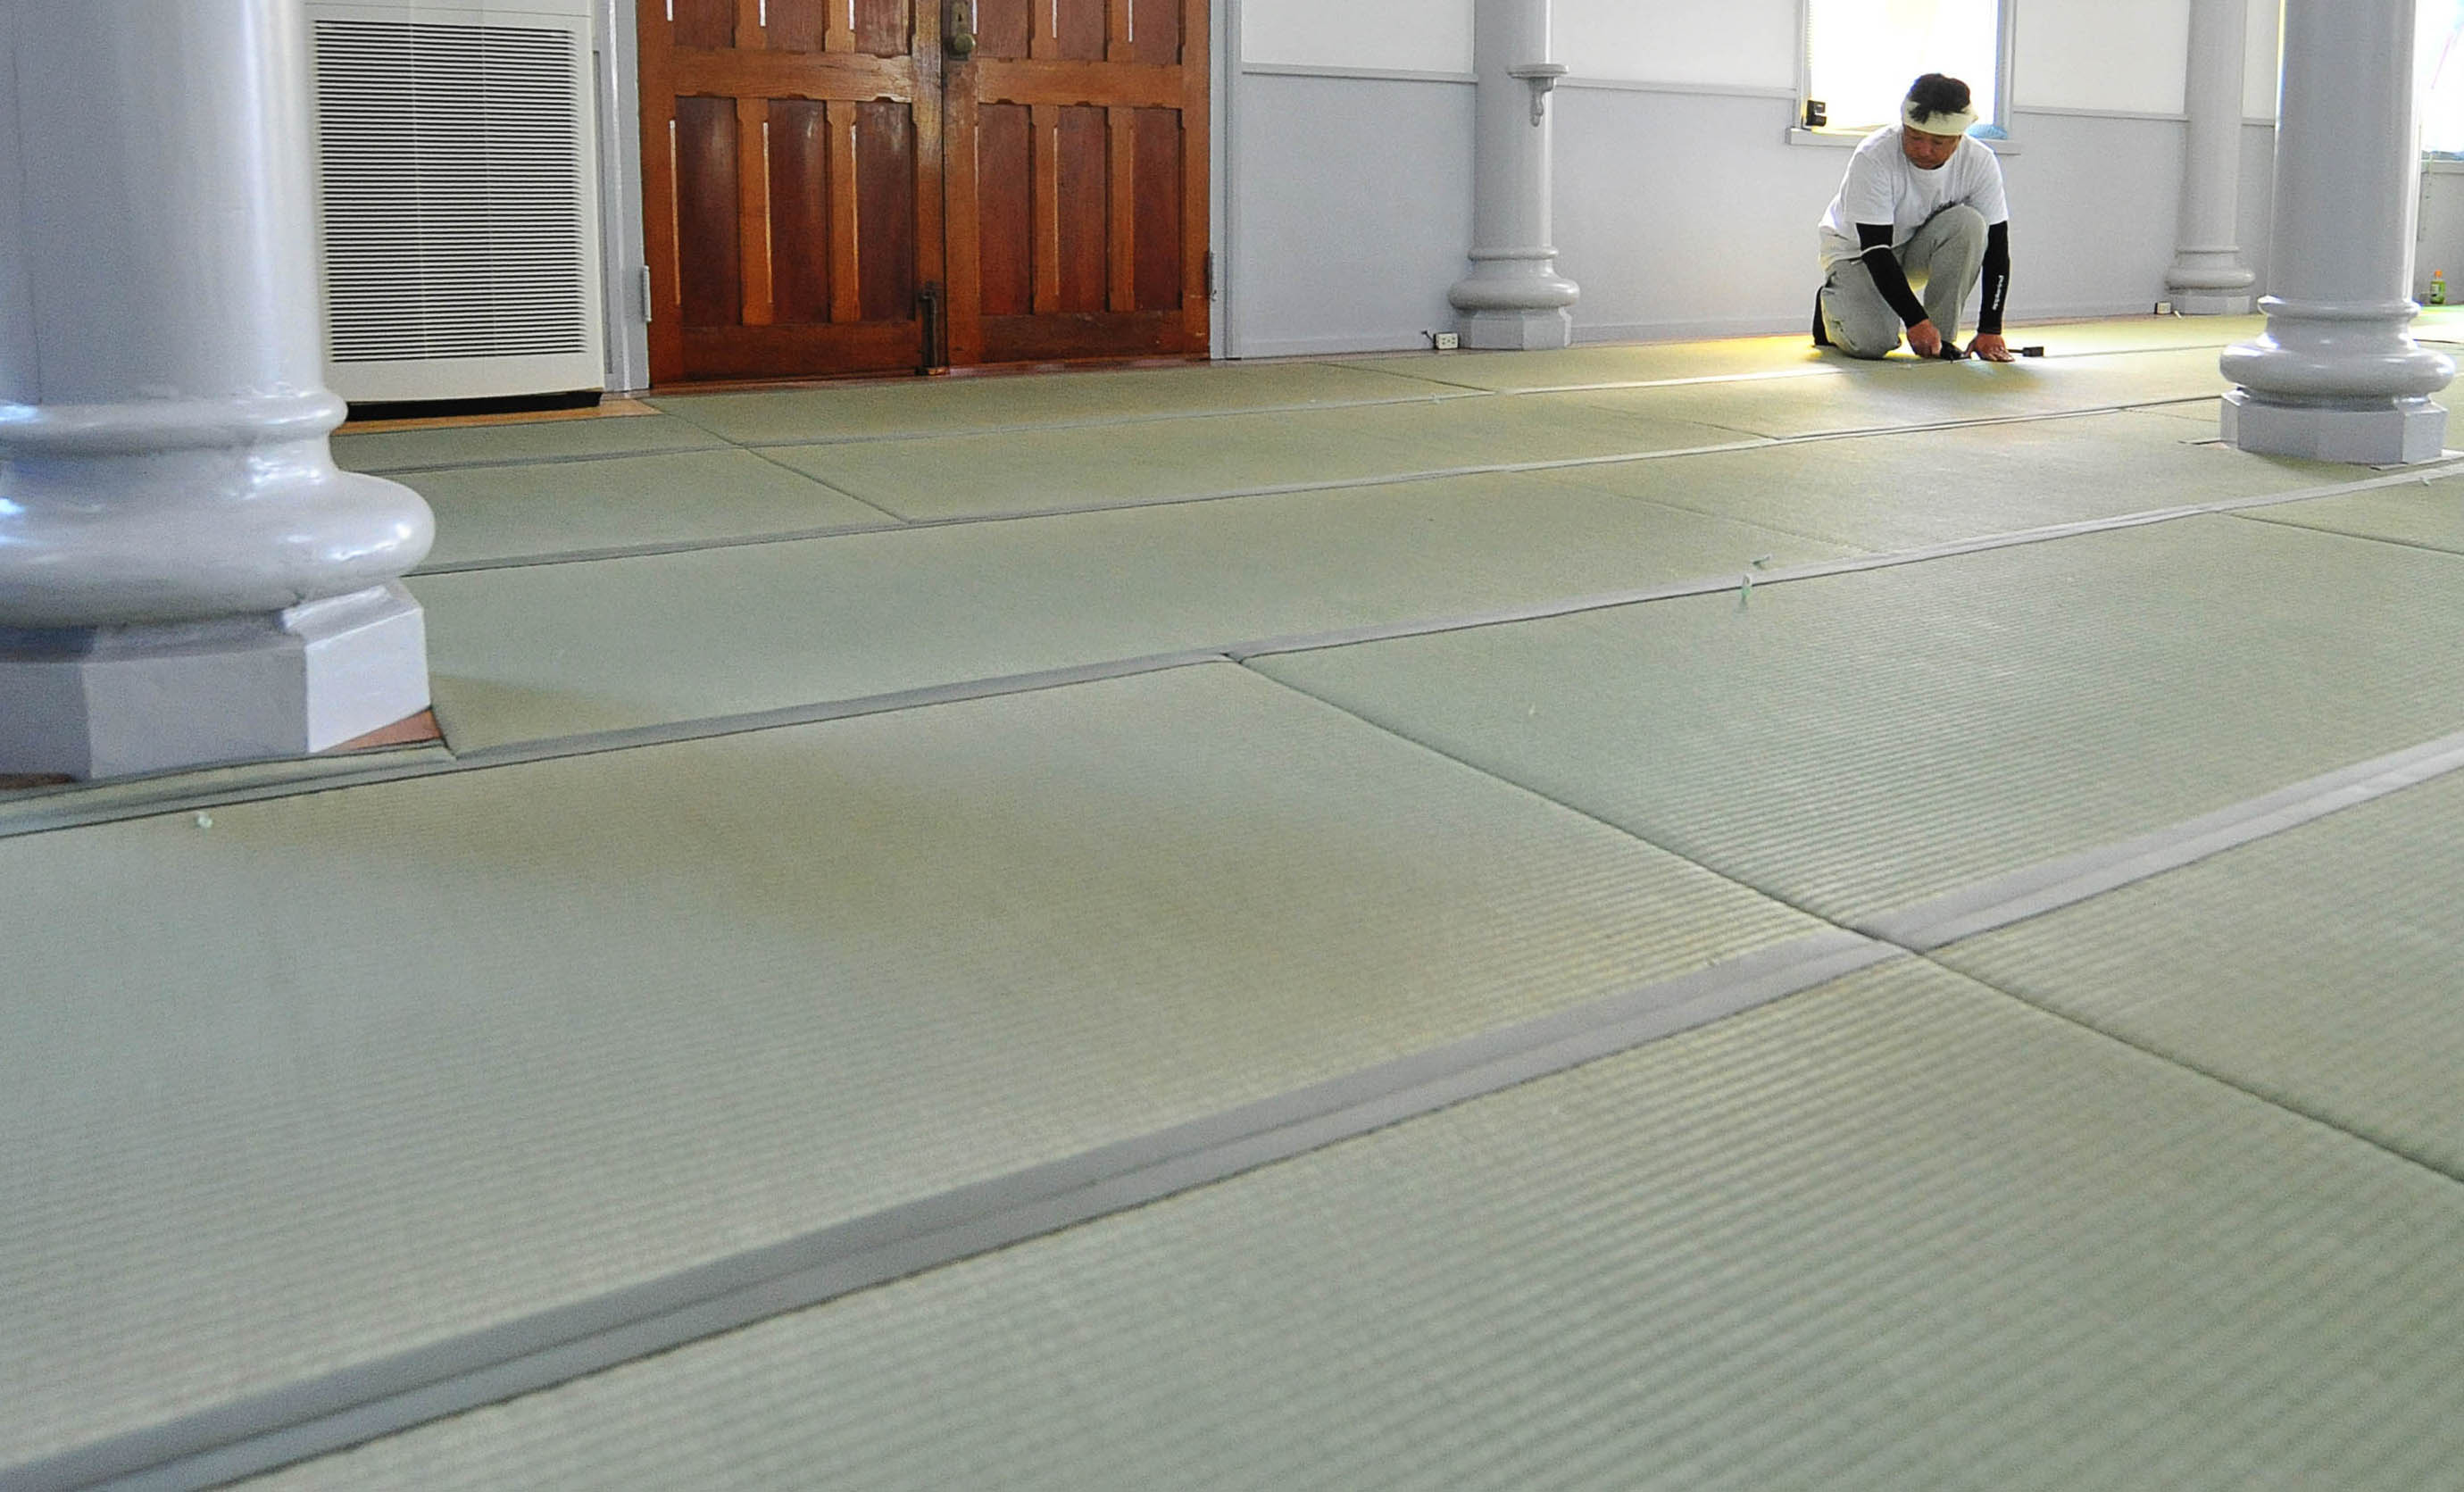 mats bed silk platform tatami frame mat beds bedding regarding traditional japanese mattress